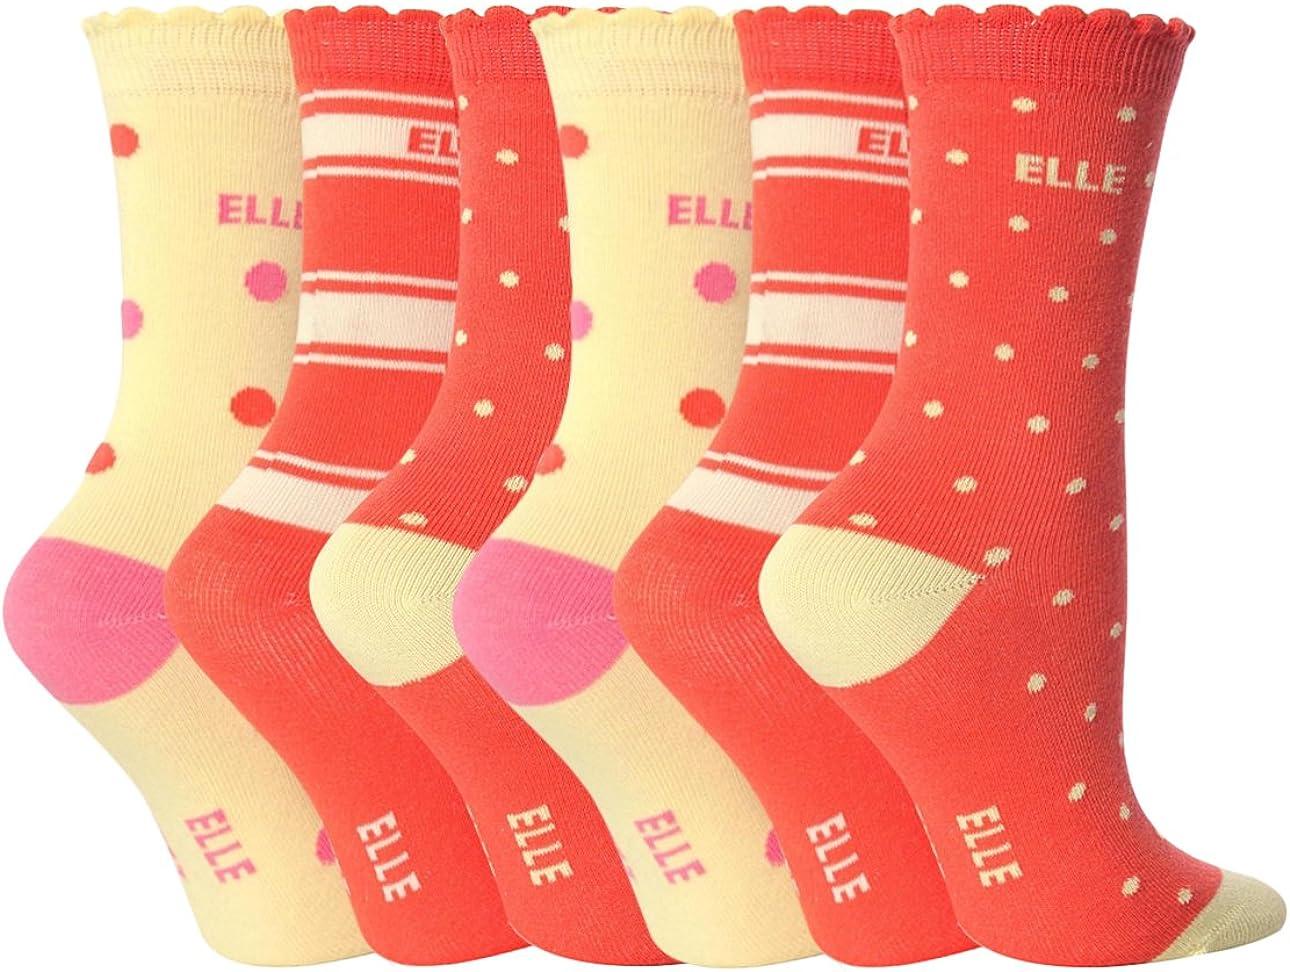 6 Pairs Girls Designer Elle Ankle Socks Orange YE08 Size 9-12 Uk 4-6 Years